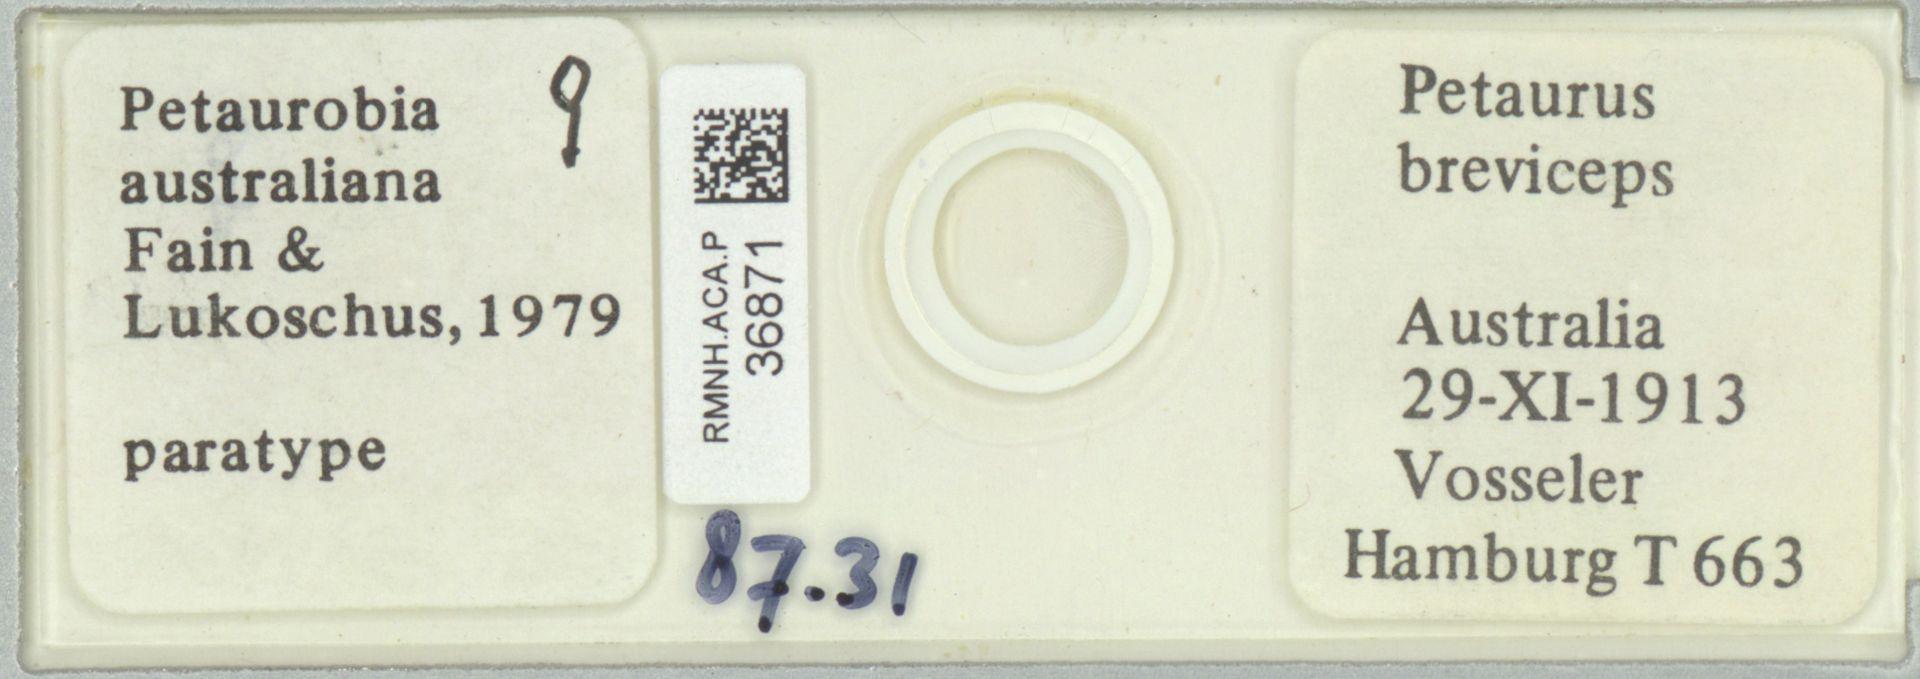 RMNH.ACA.P.36871   Petaurobia australiana Fain & Lukoschus, 1979